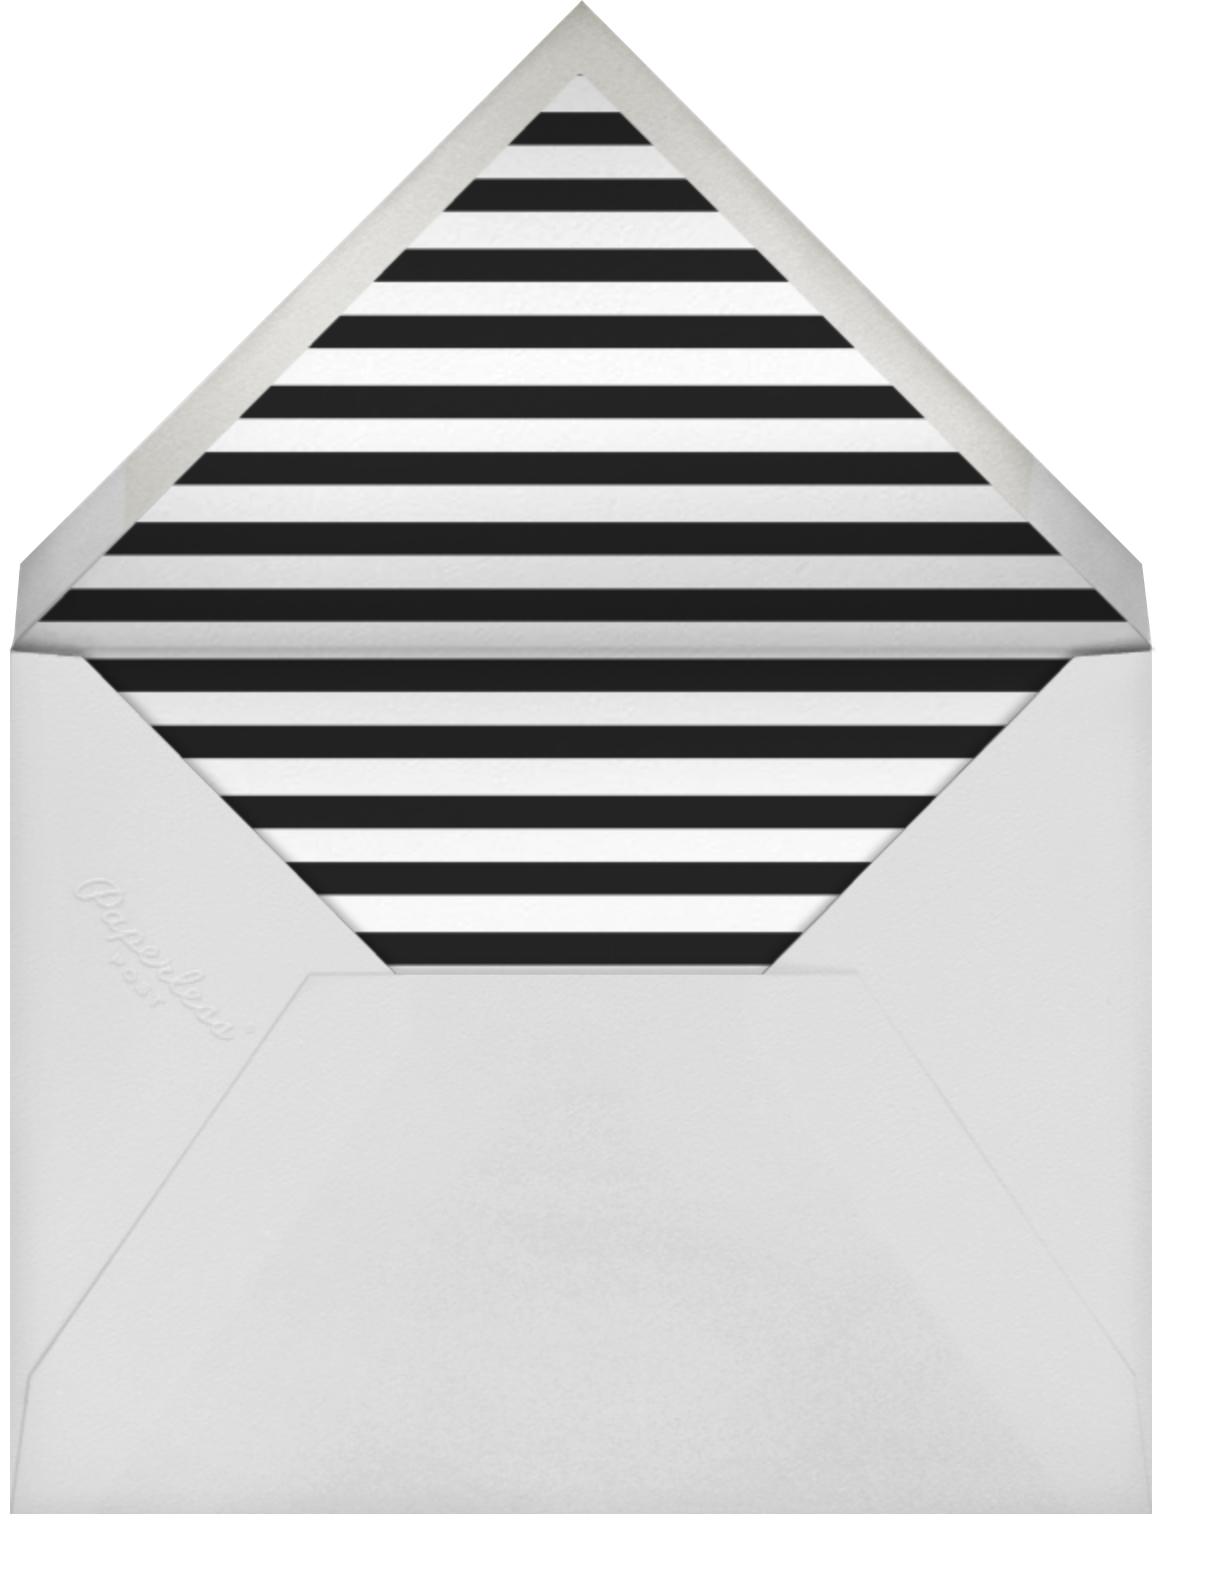 Confetti Shimmer - kate spade new york - General entertaining - envelope back